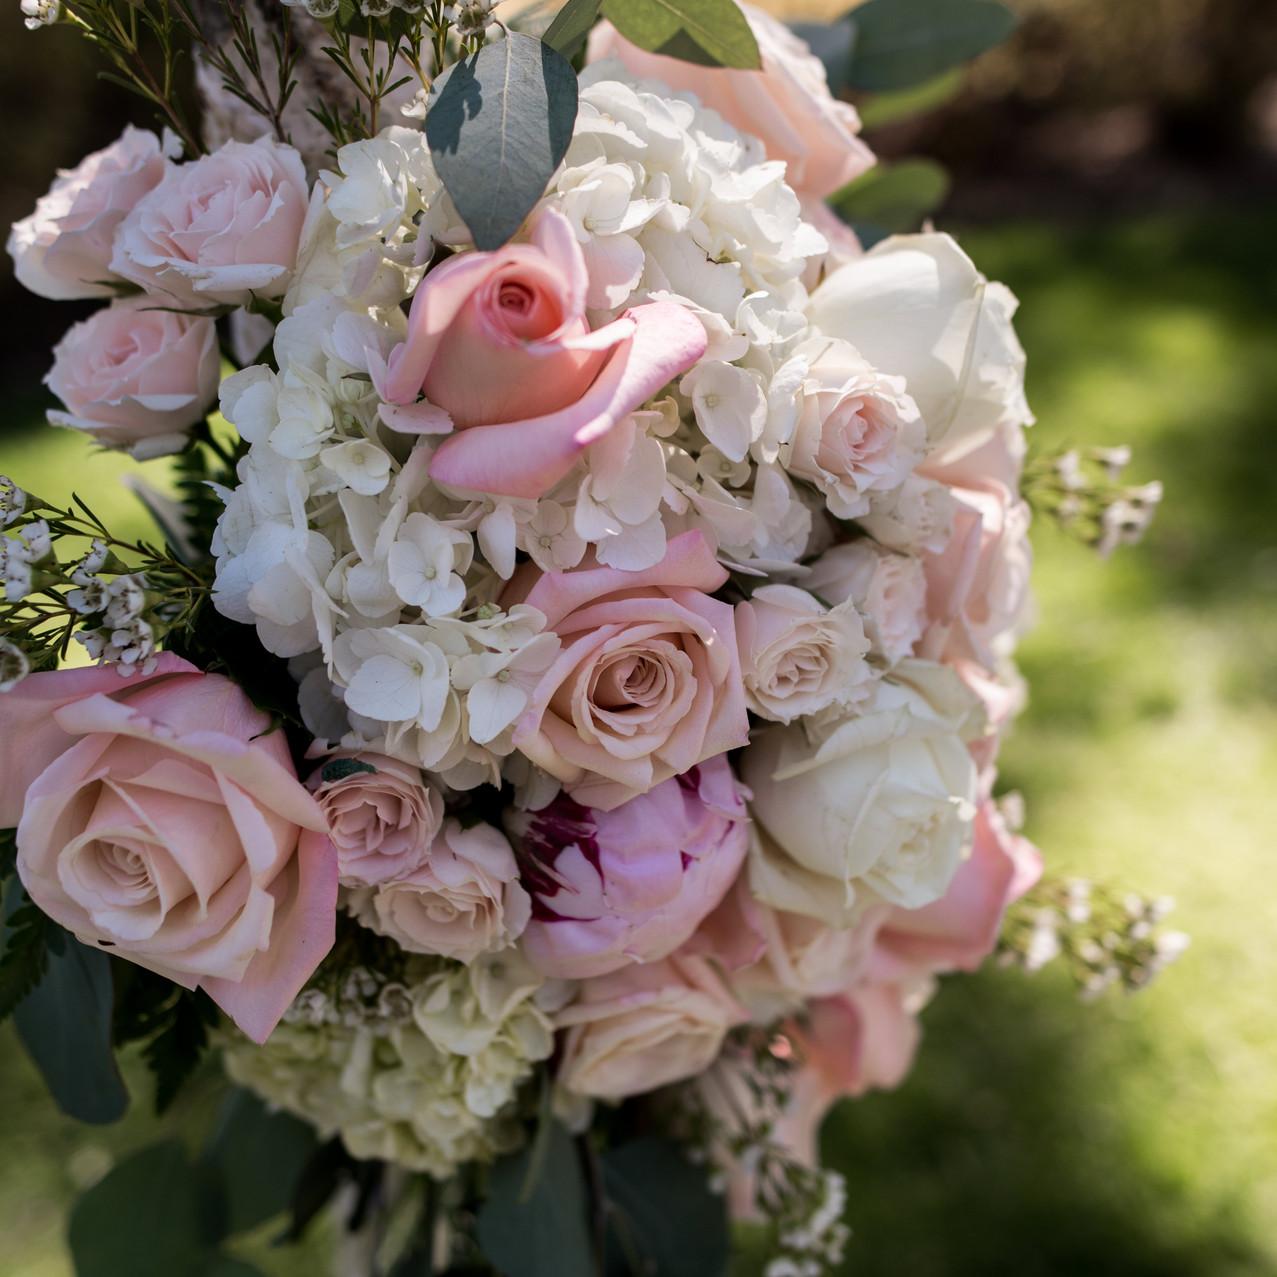 A-Floral-Affair-HYATT-LAKE-TAHOE-WEDDING-FLORIST (6)